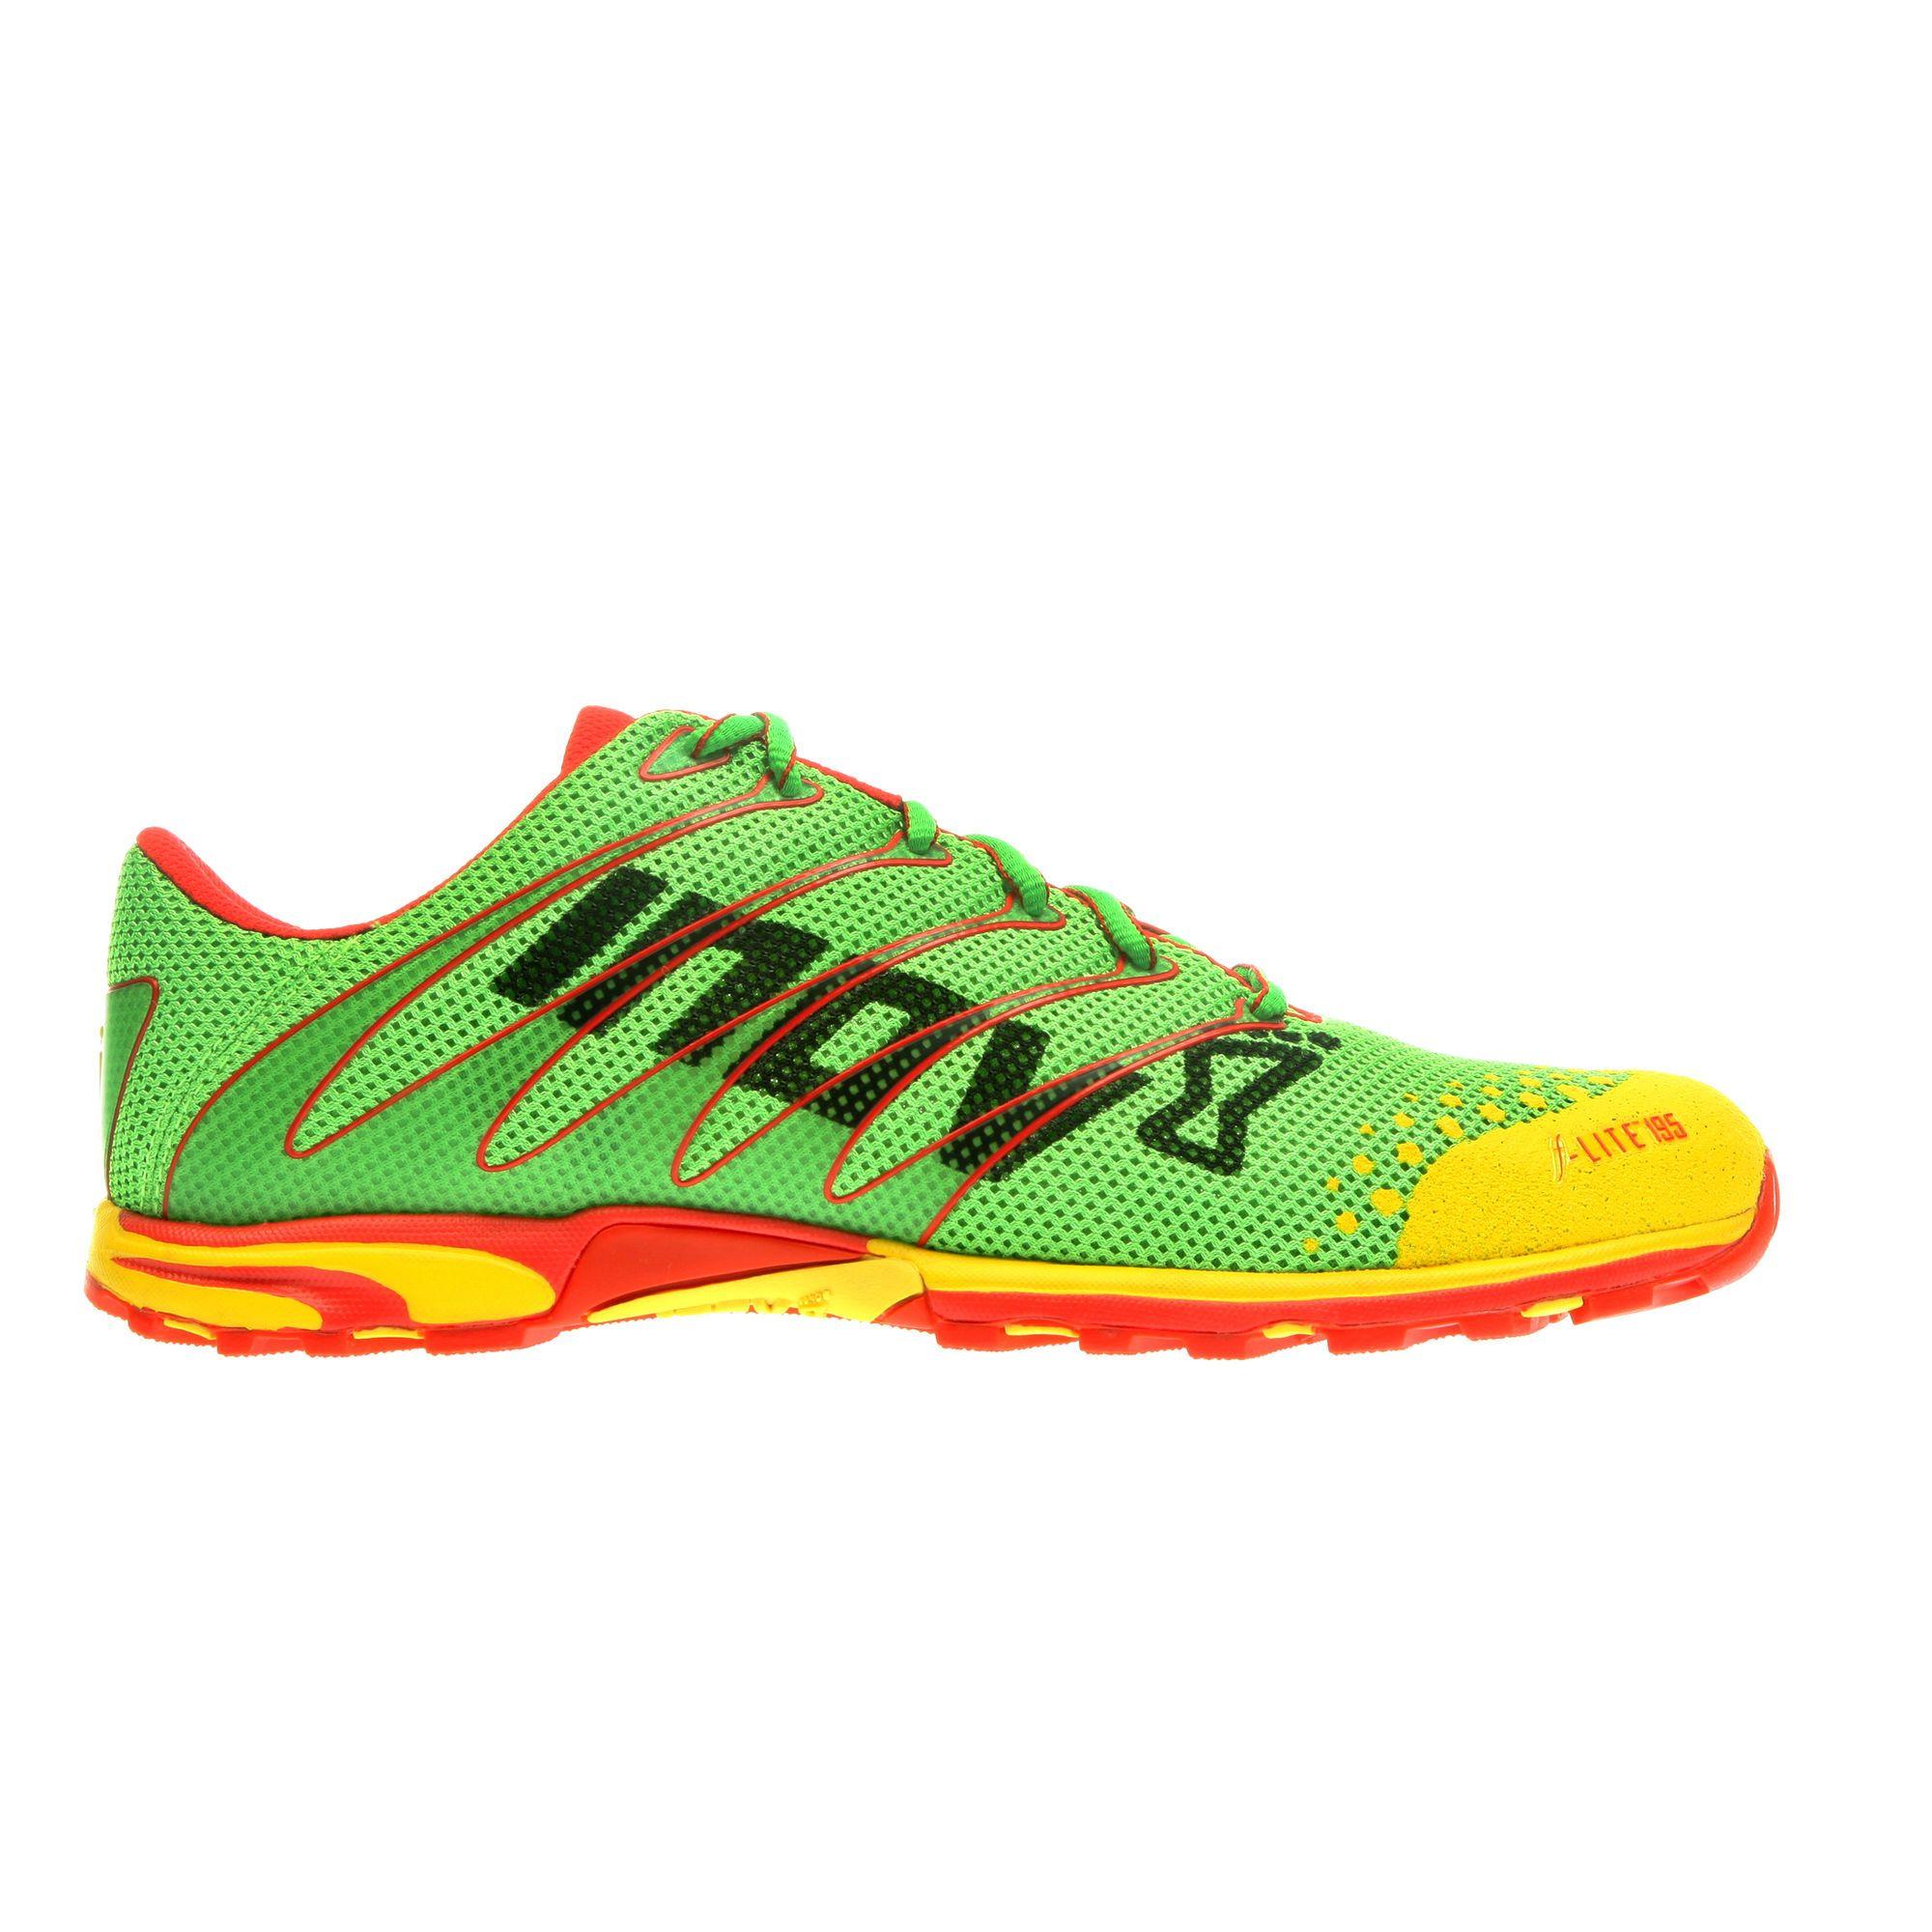 Womens running shoes, Cross training